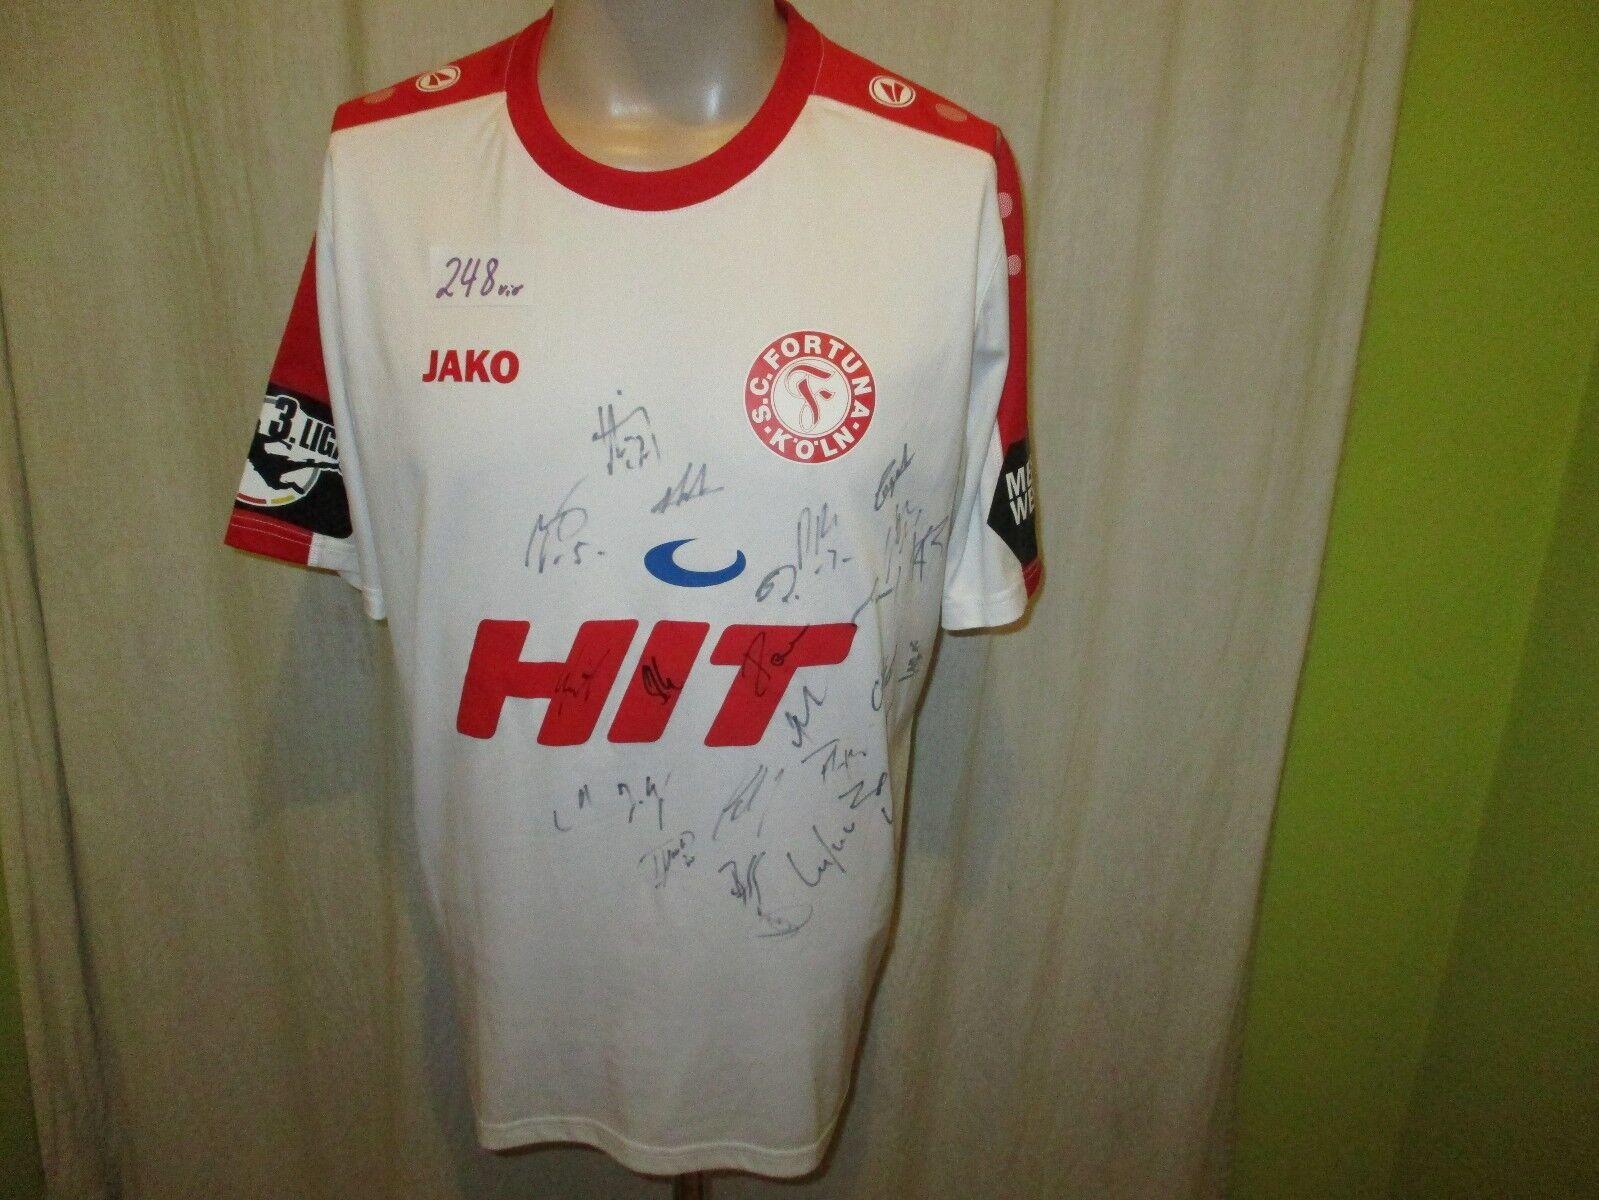 Fortuna Köln Jako Jako Jako Spieler Version Trikot 2016/17